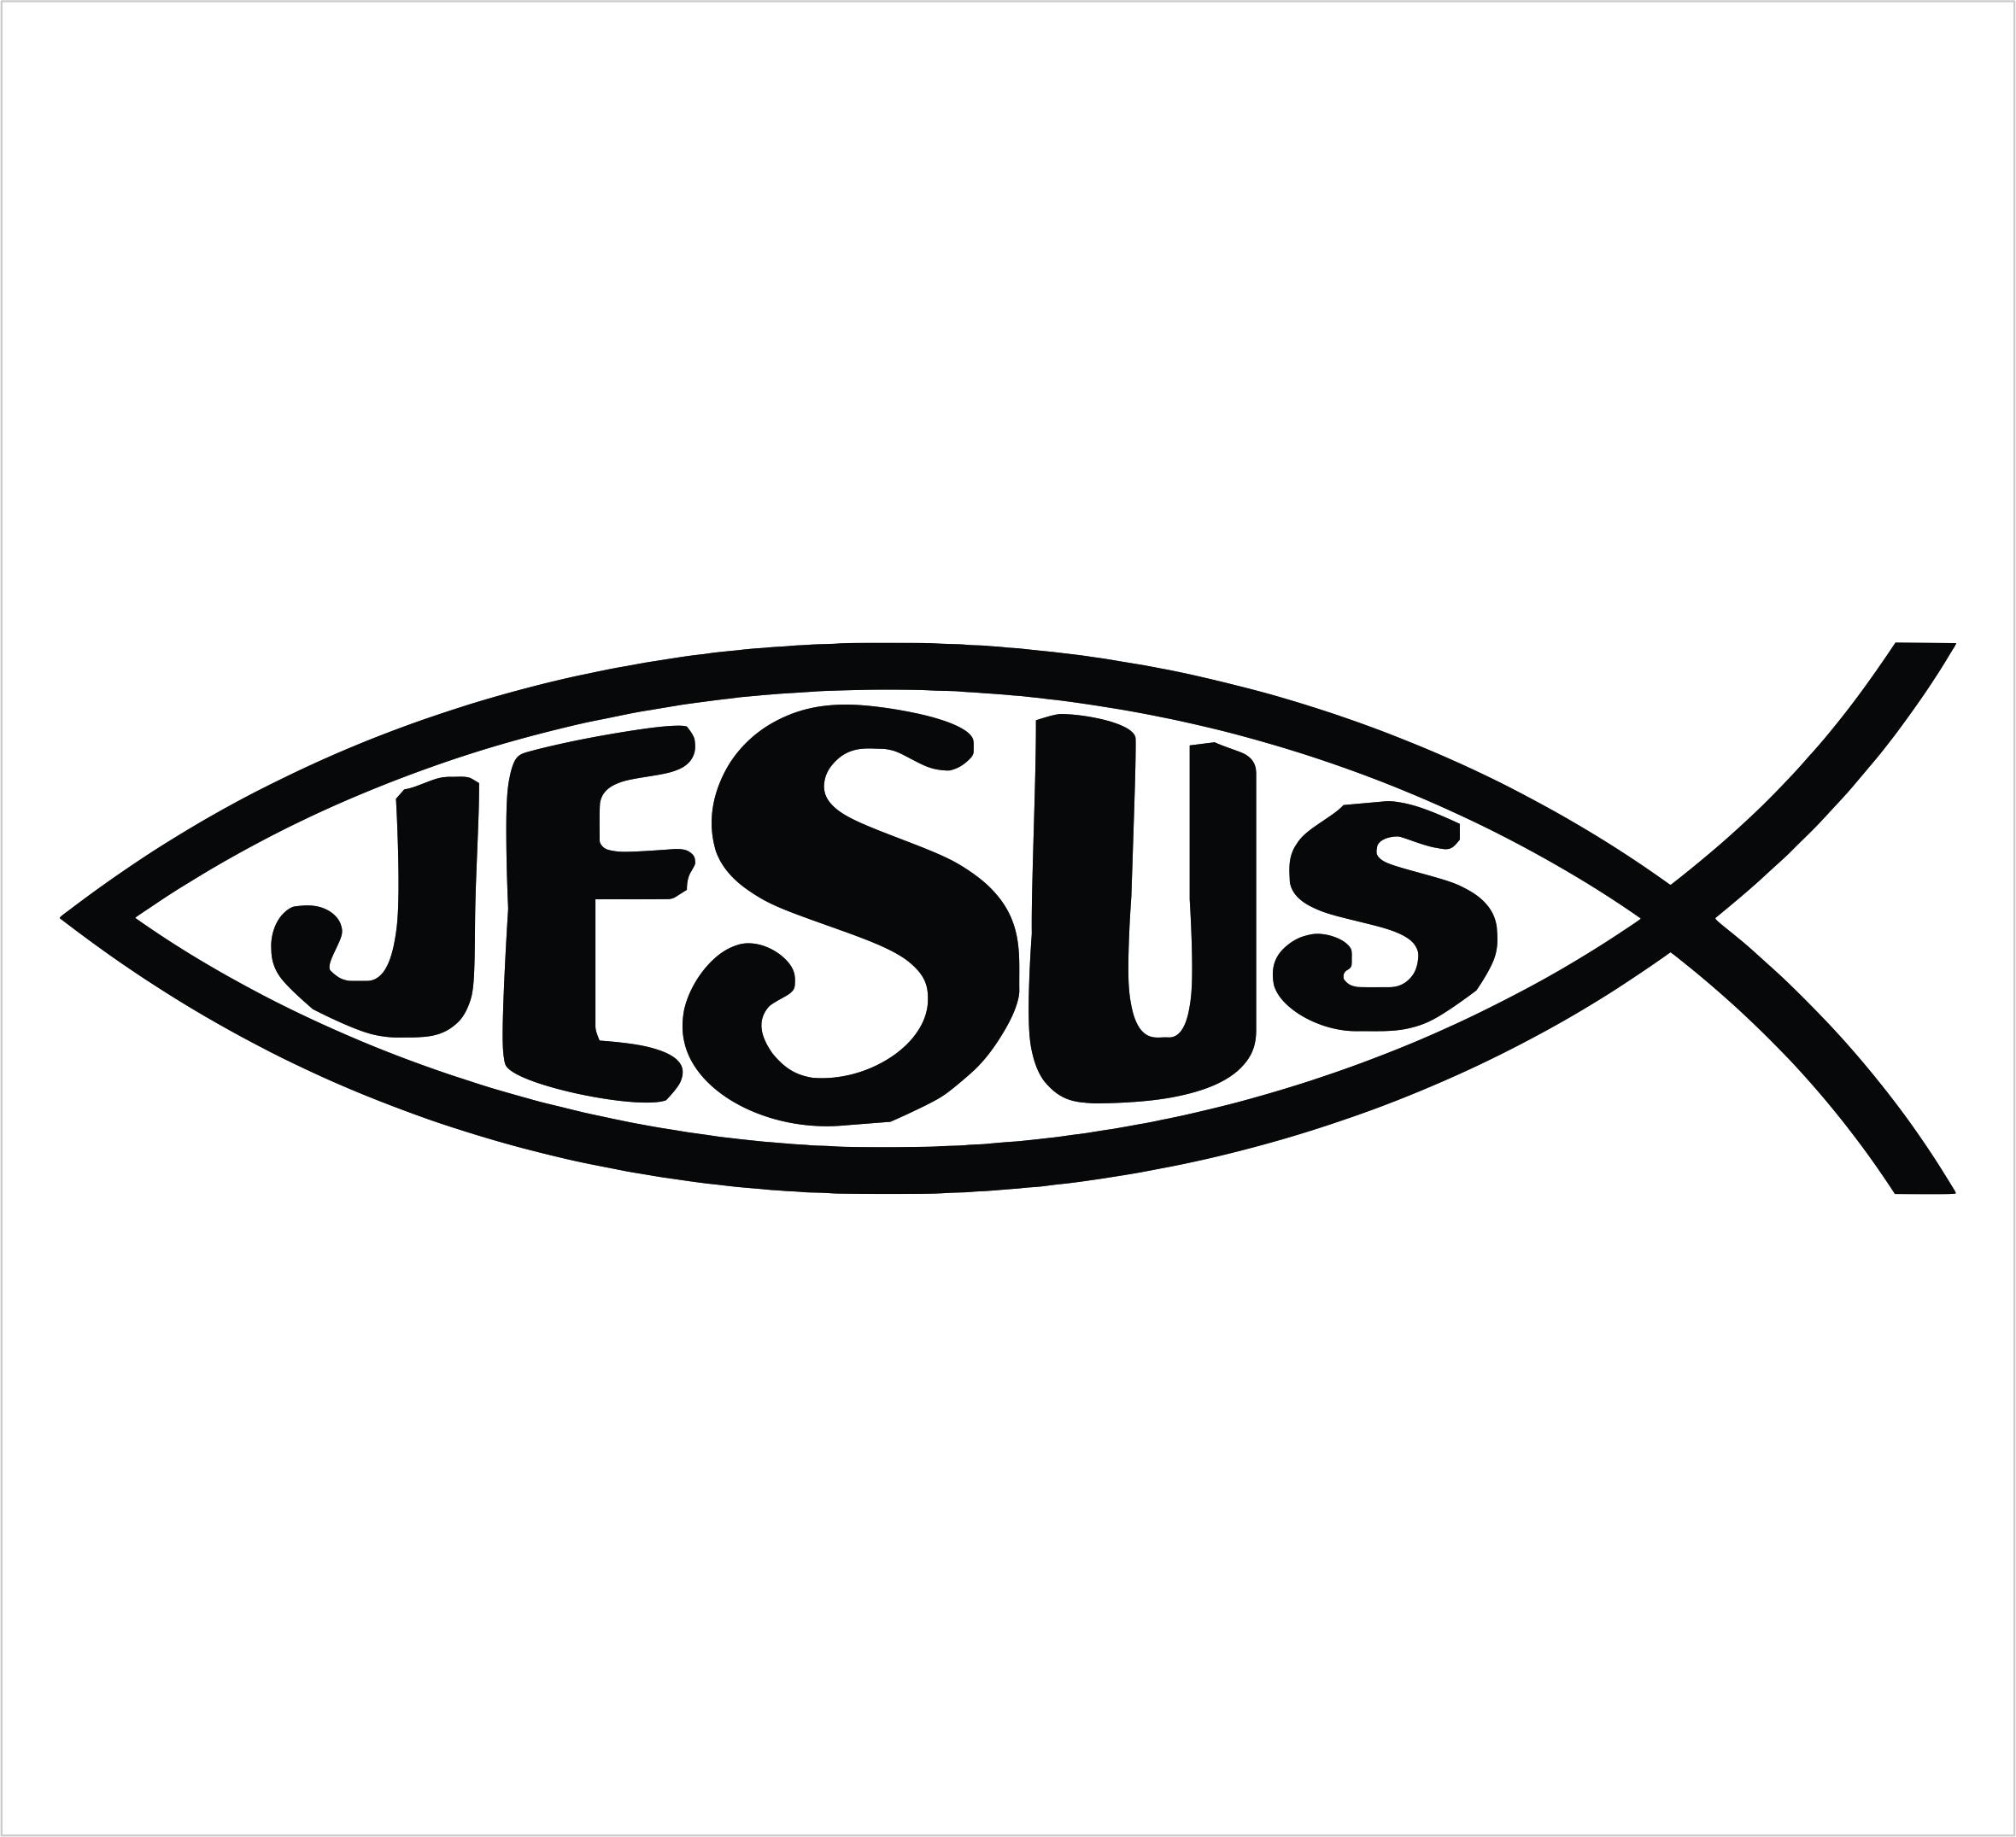 Jesus fish clipart clipart suggest for Jesus fish symbol